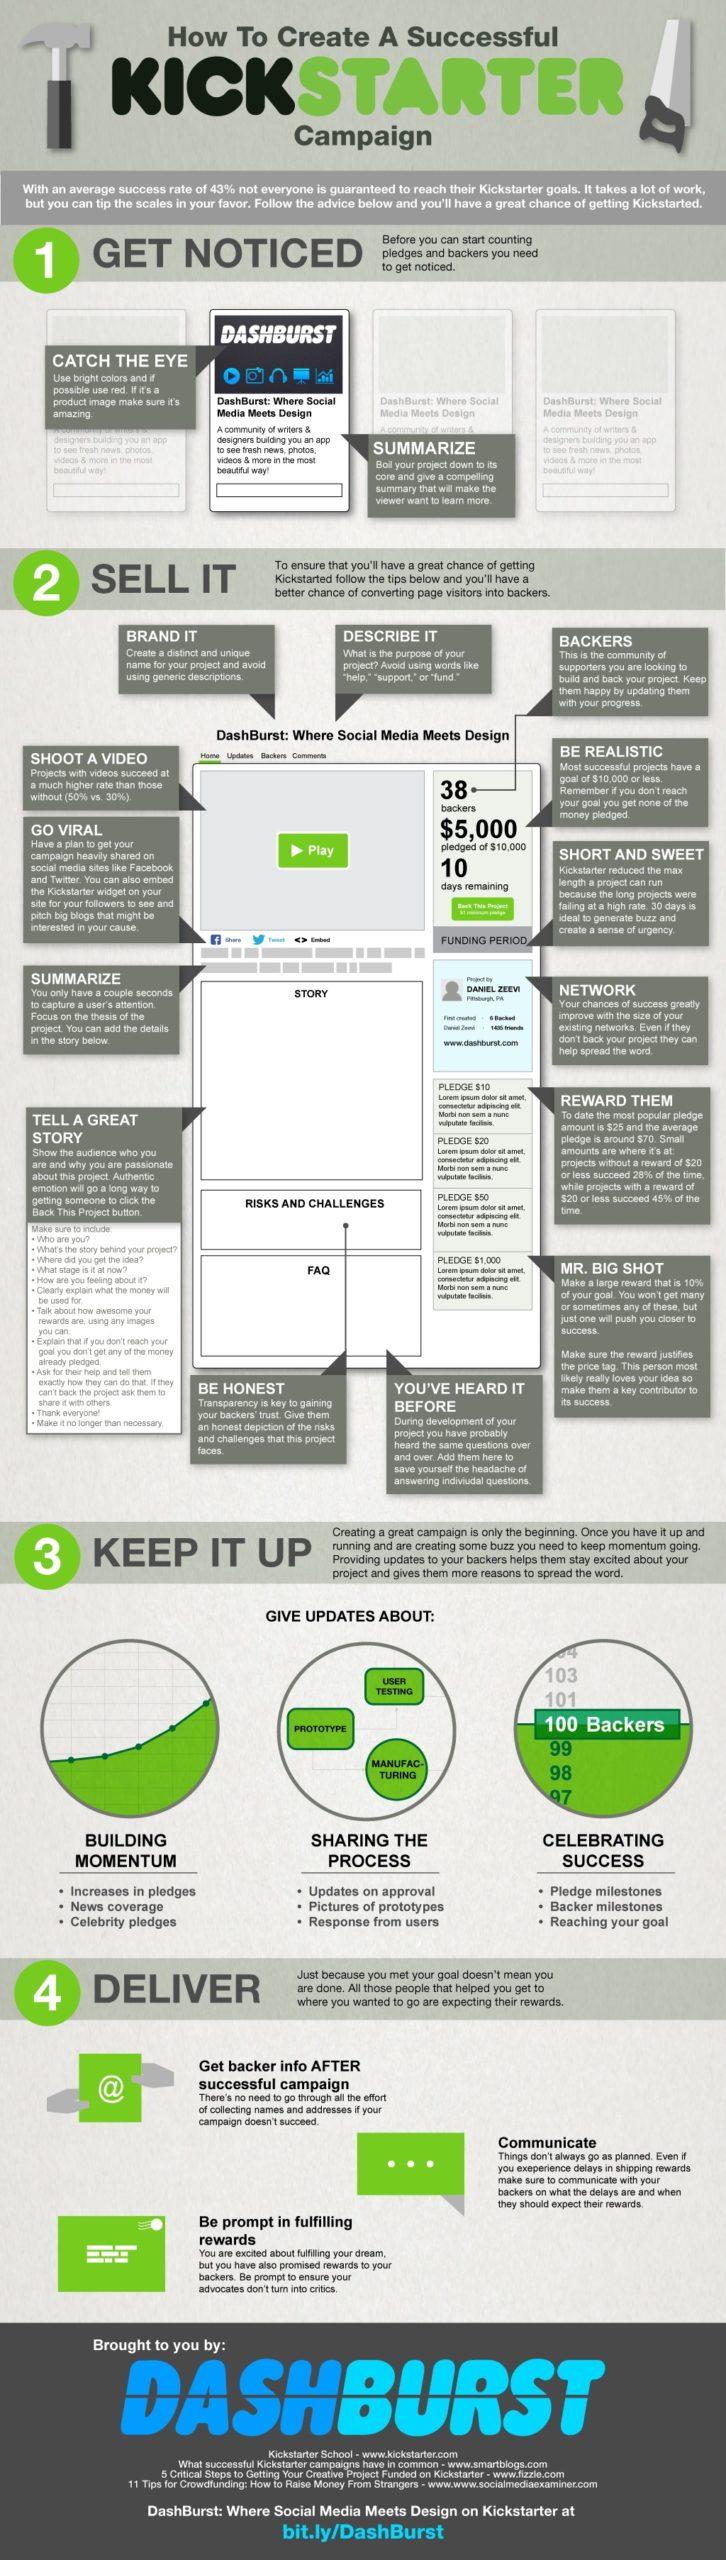 Kickstarter campaign infographic